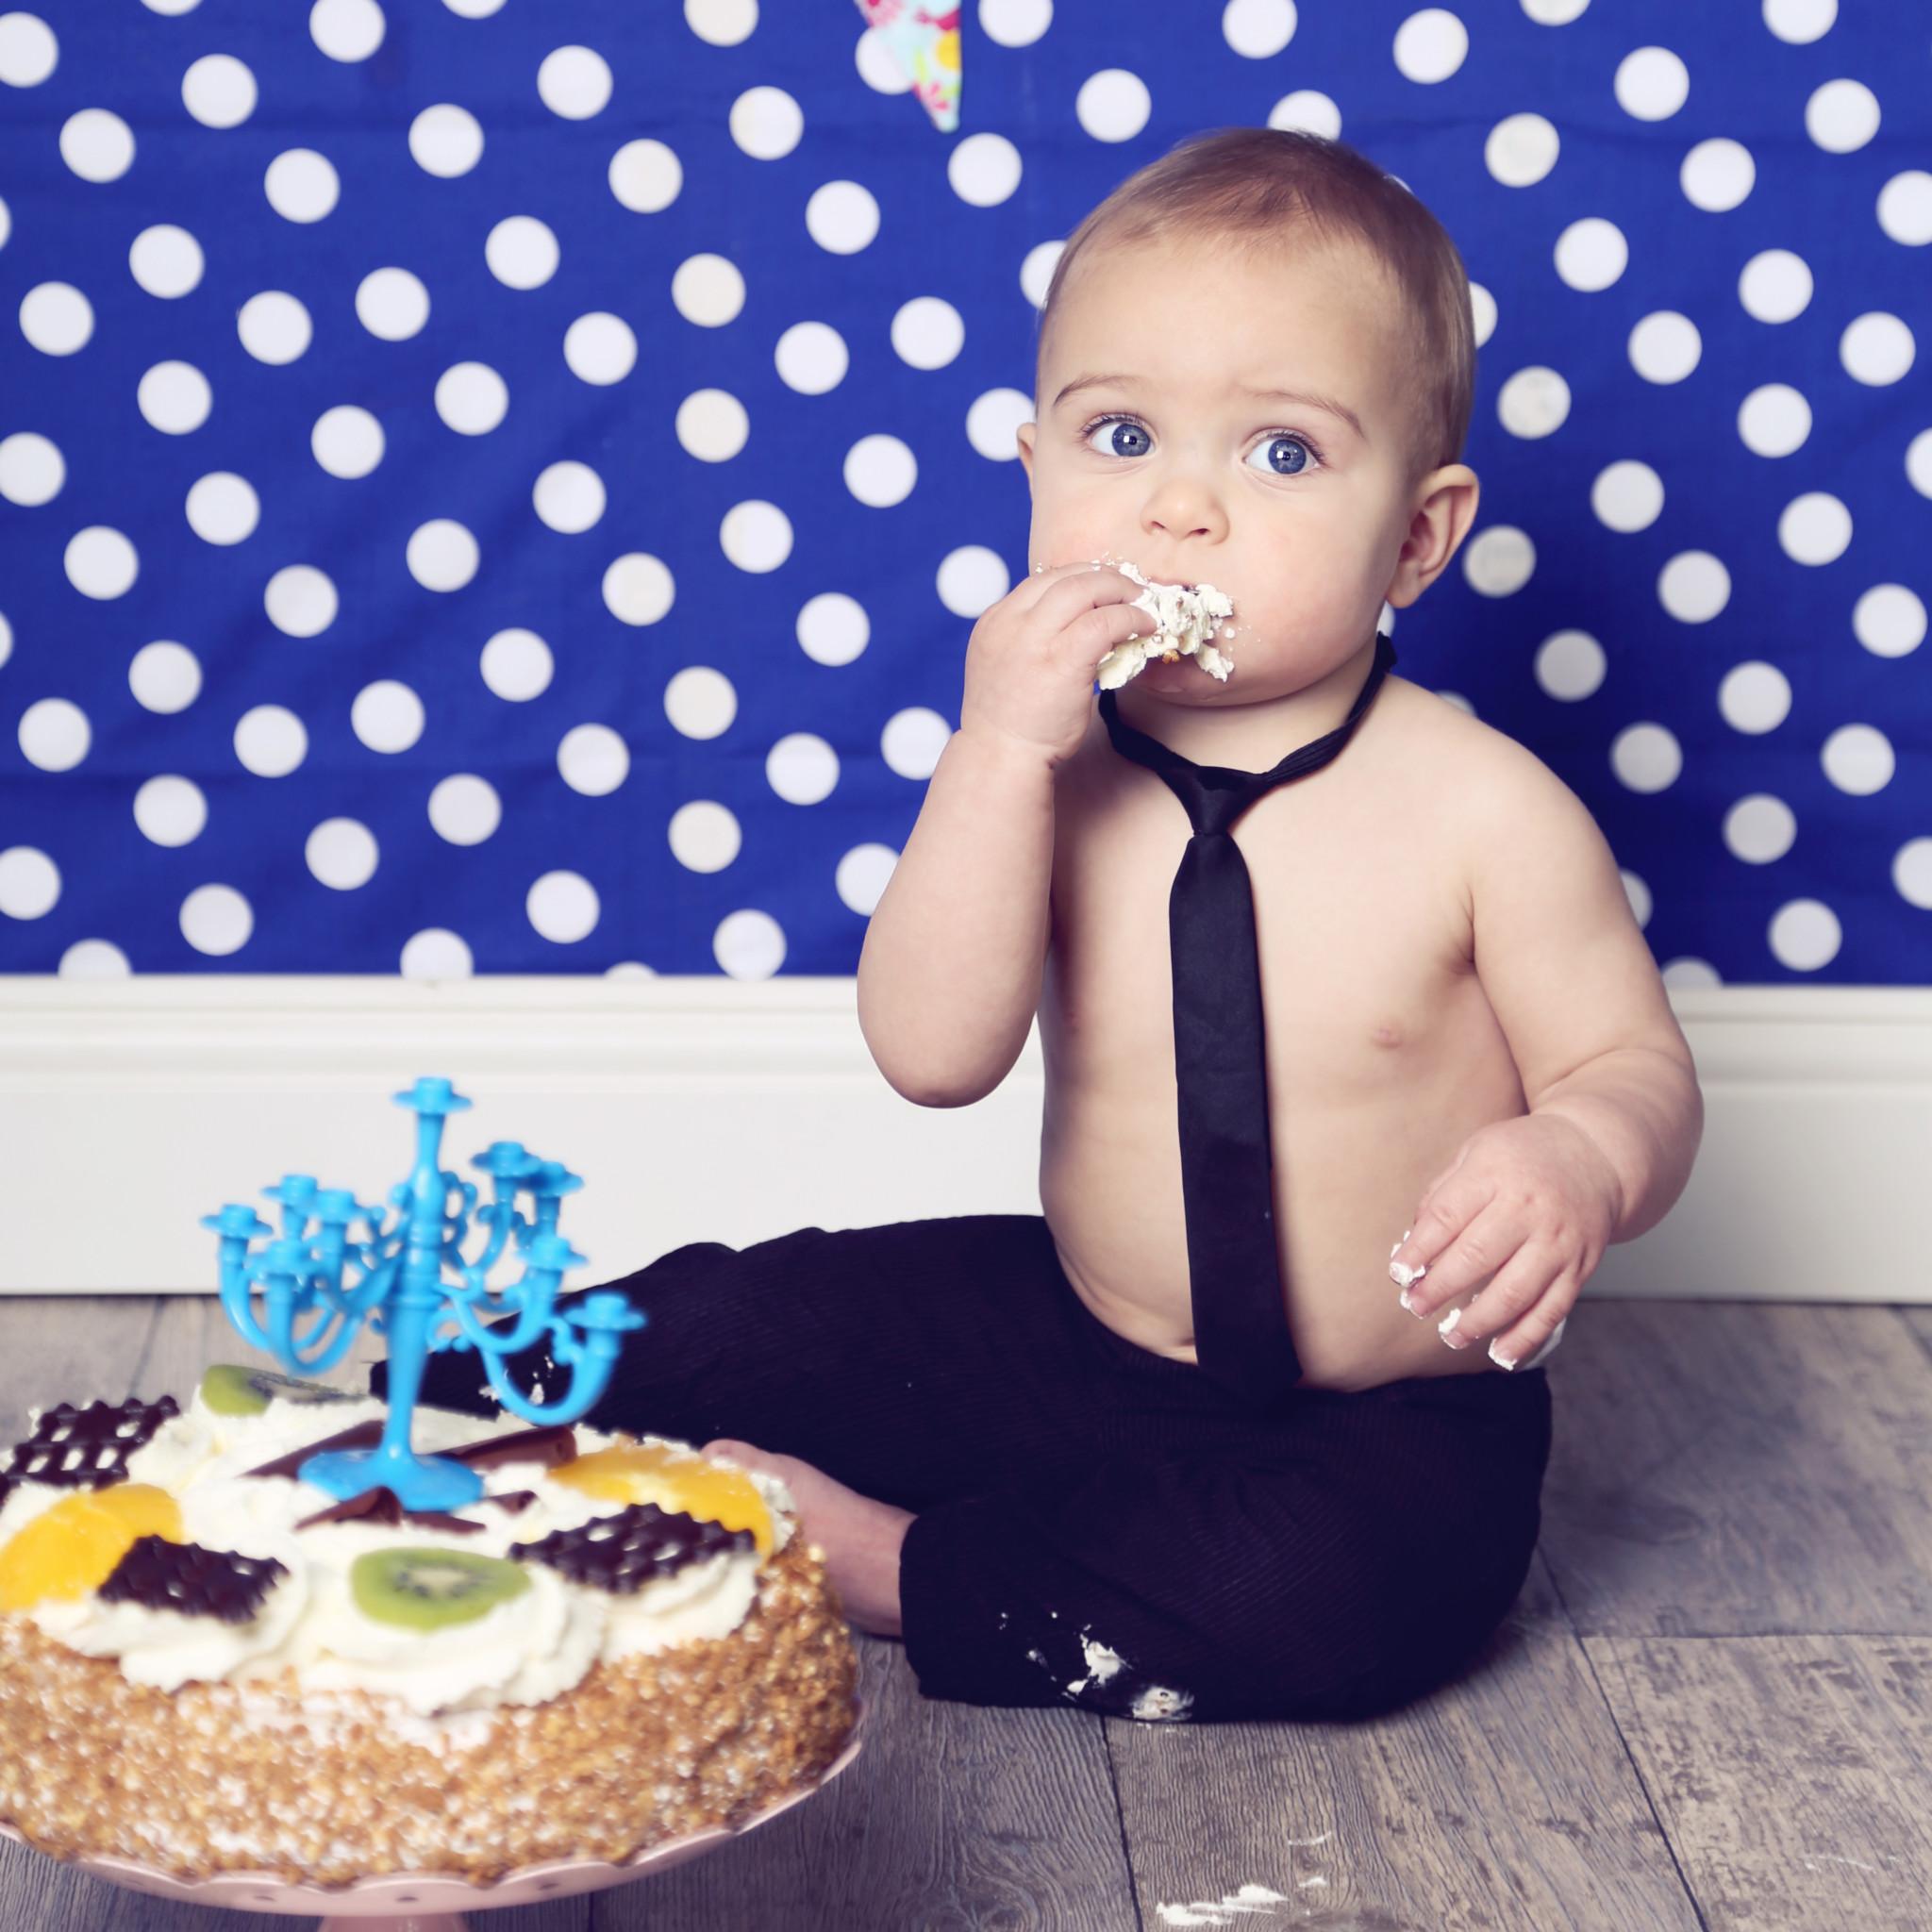 Taartsnoetjes - Cake smash- Suusfotosjop